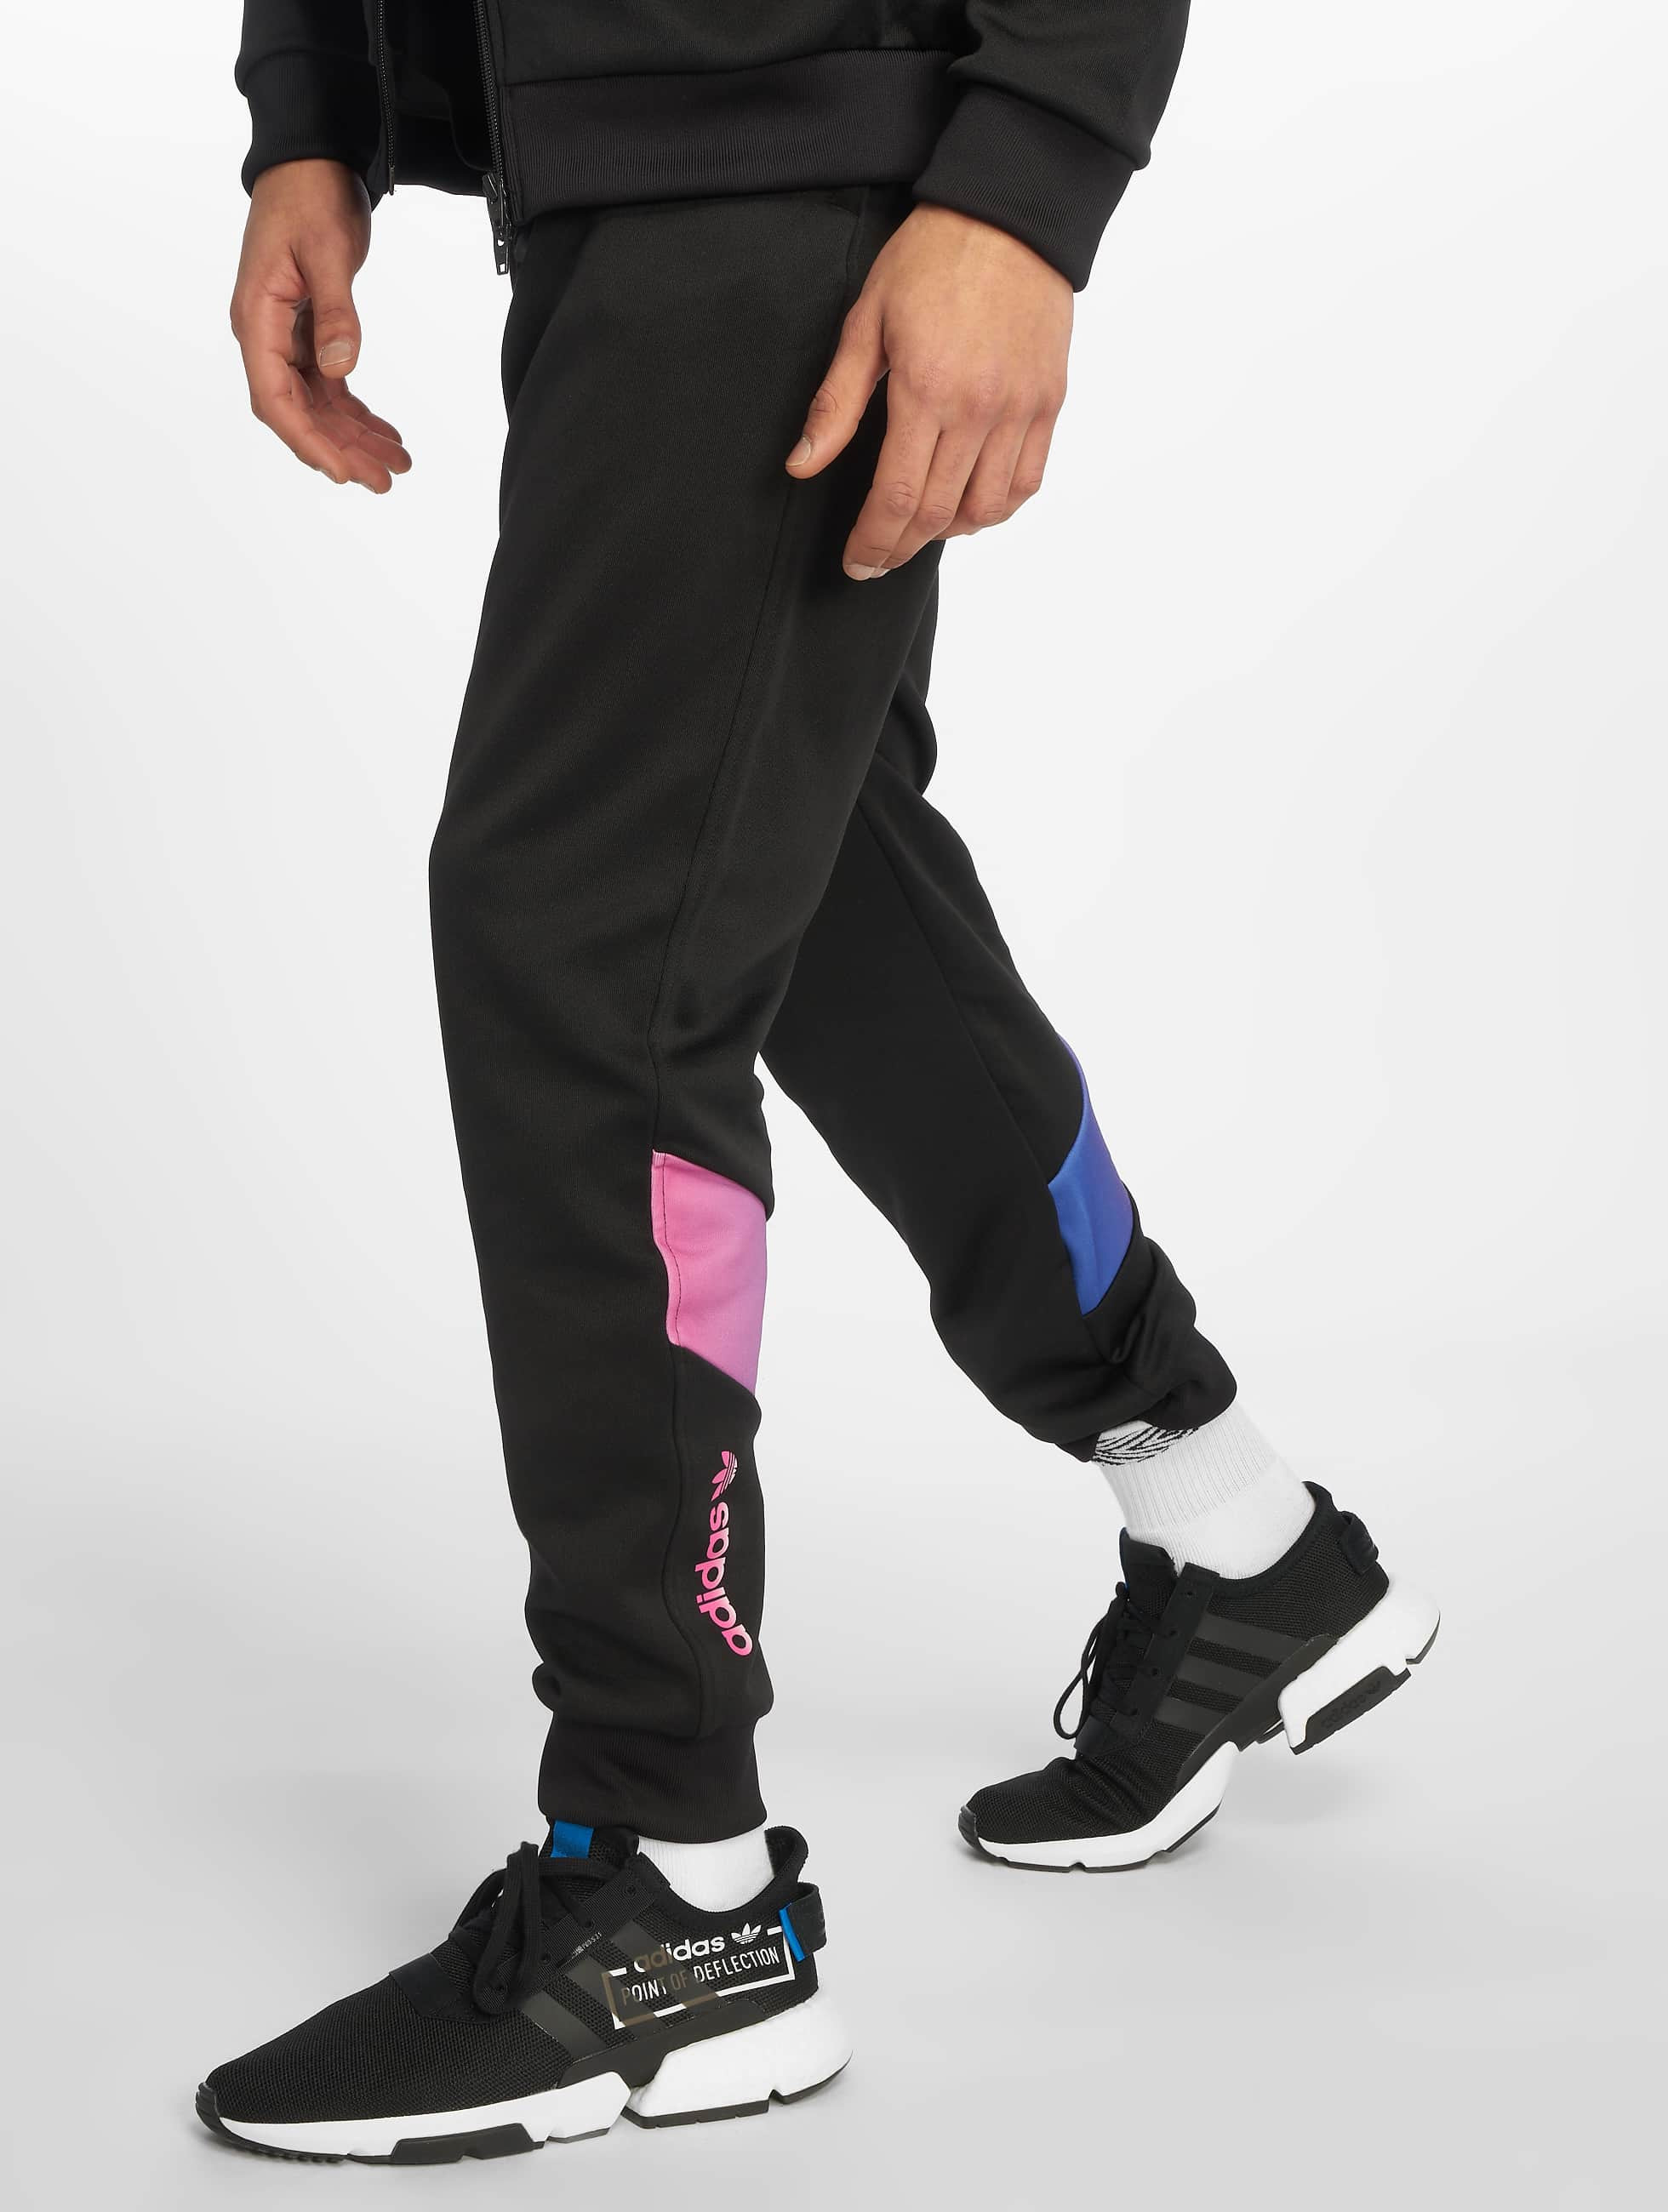 e161c379a5a adidas originals broek / joggingbroek Degrade in zwart 598696